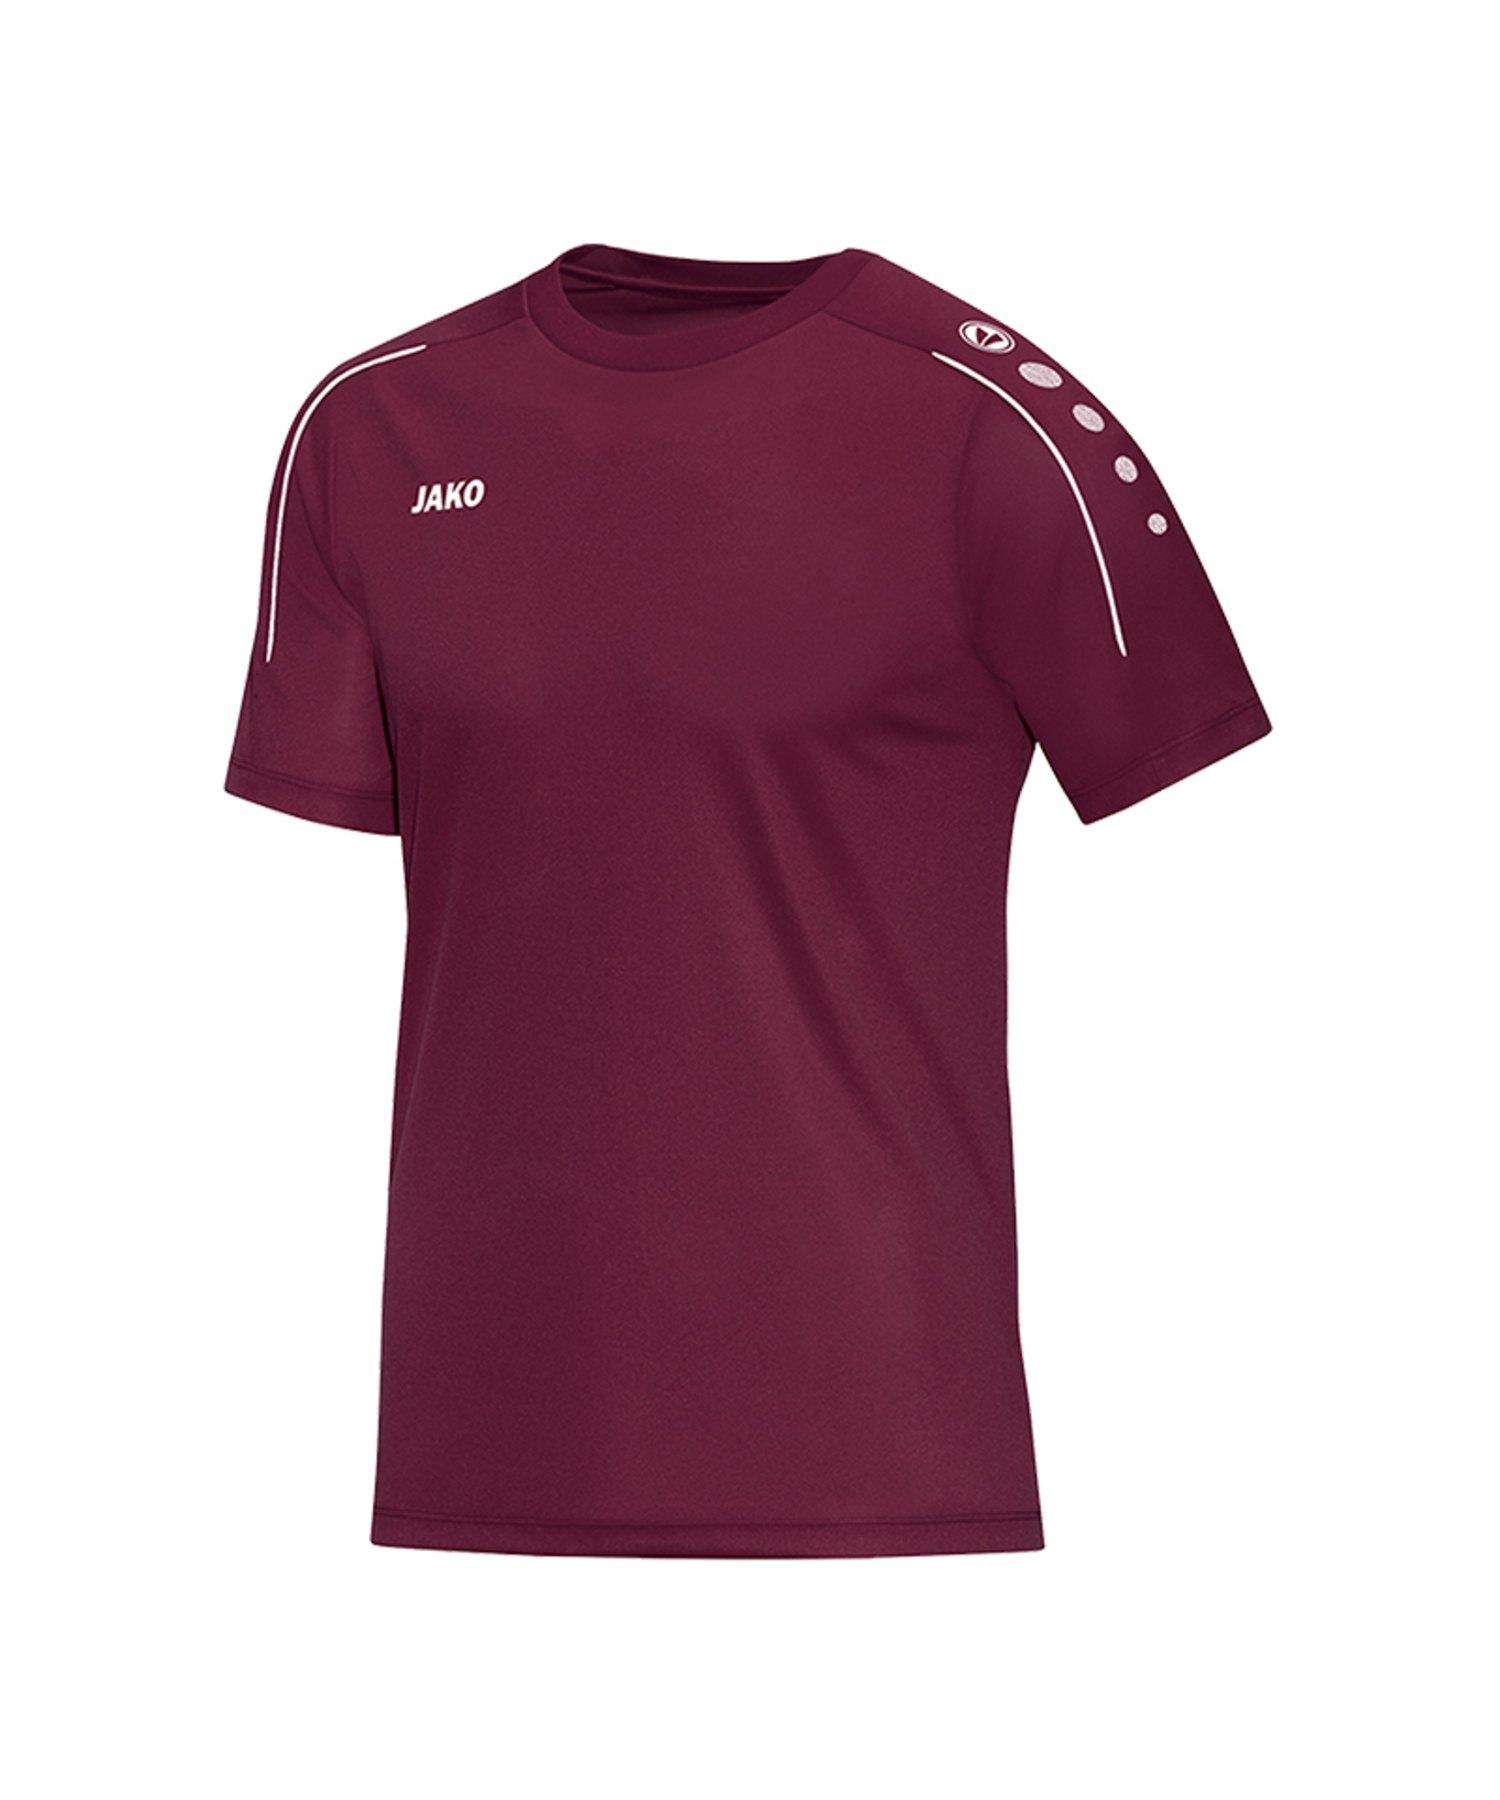 Jako Classico T-Shirt Weinrot F14 - Rot